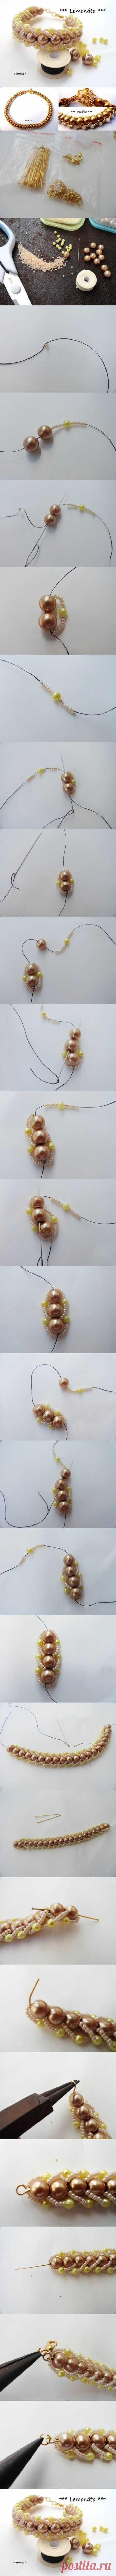 DIY Elegant Beads Bracelet | iCreativeIdeas.com